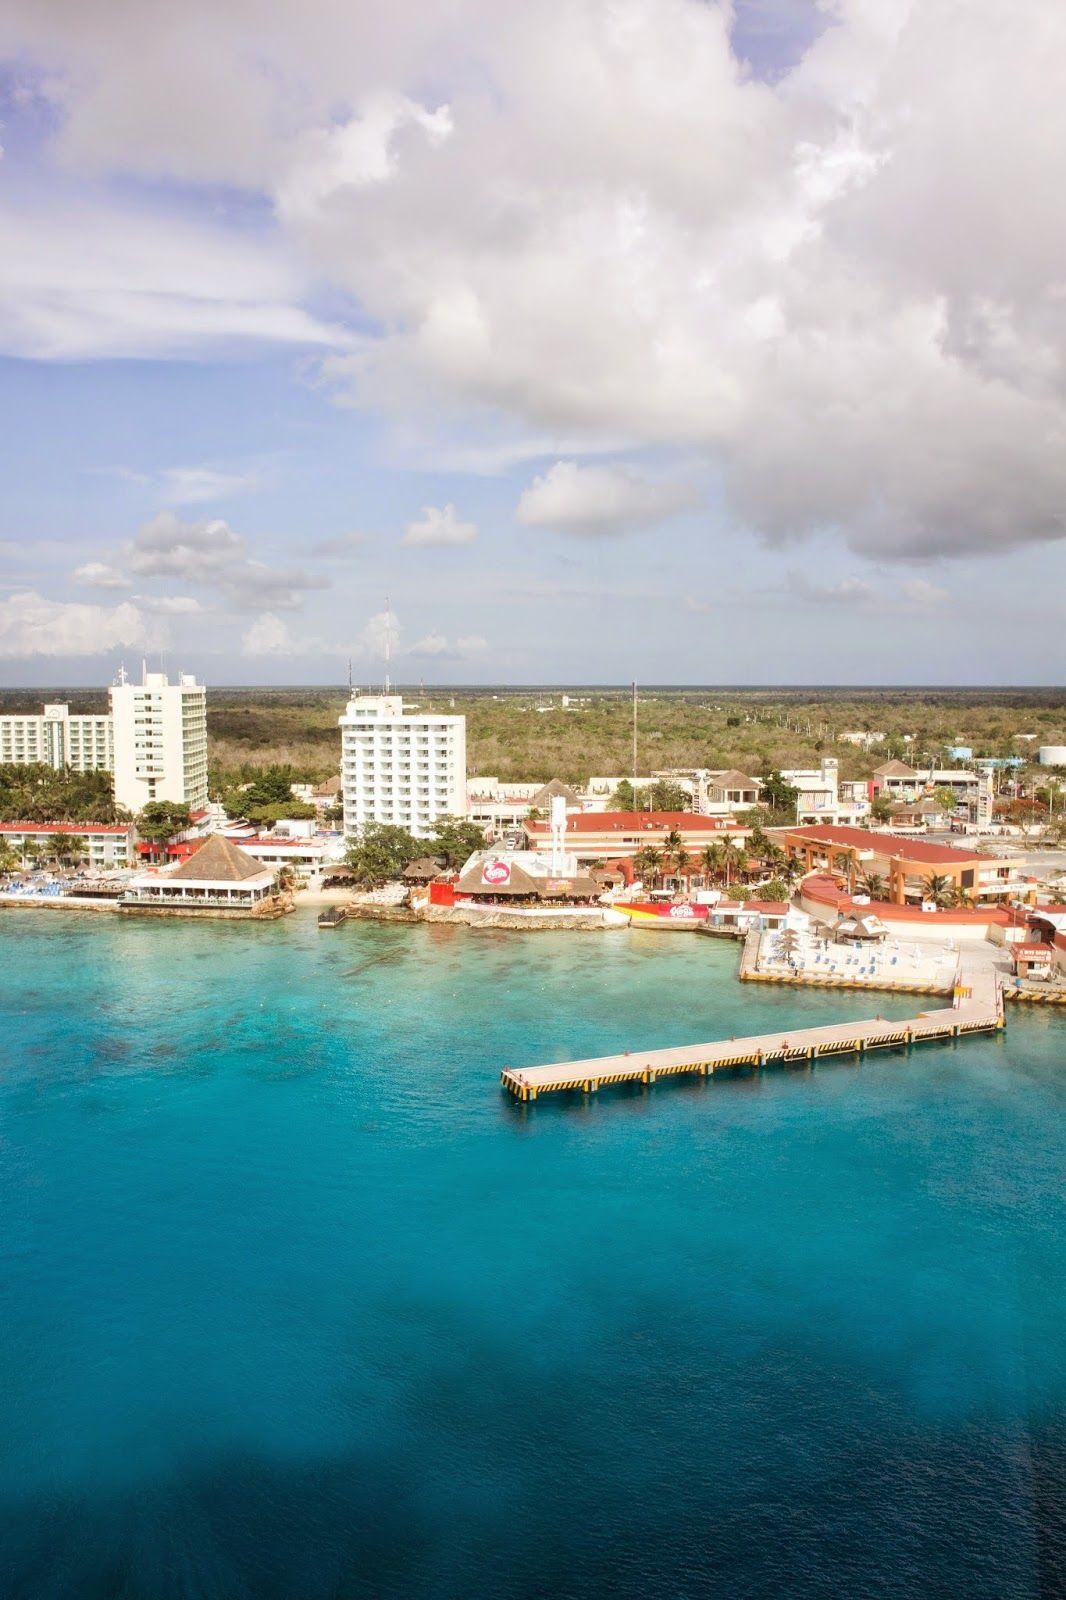 Royal Caribbean Cruise Port Cozumel Cruisein Baby